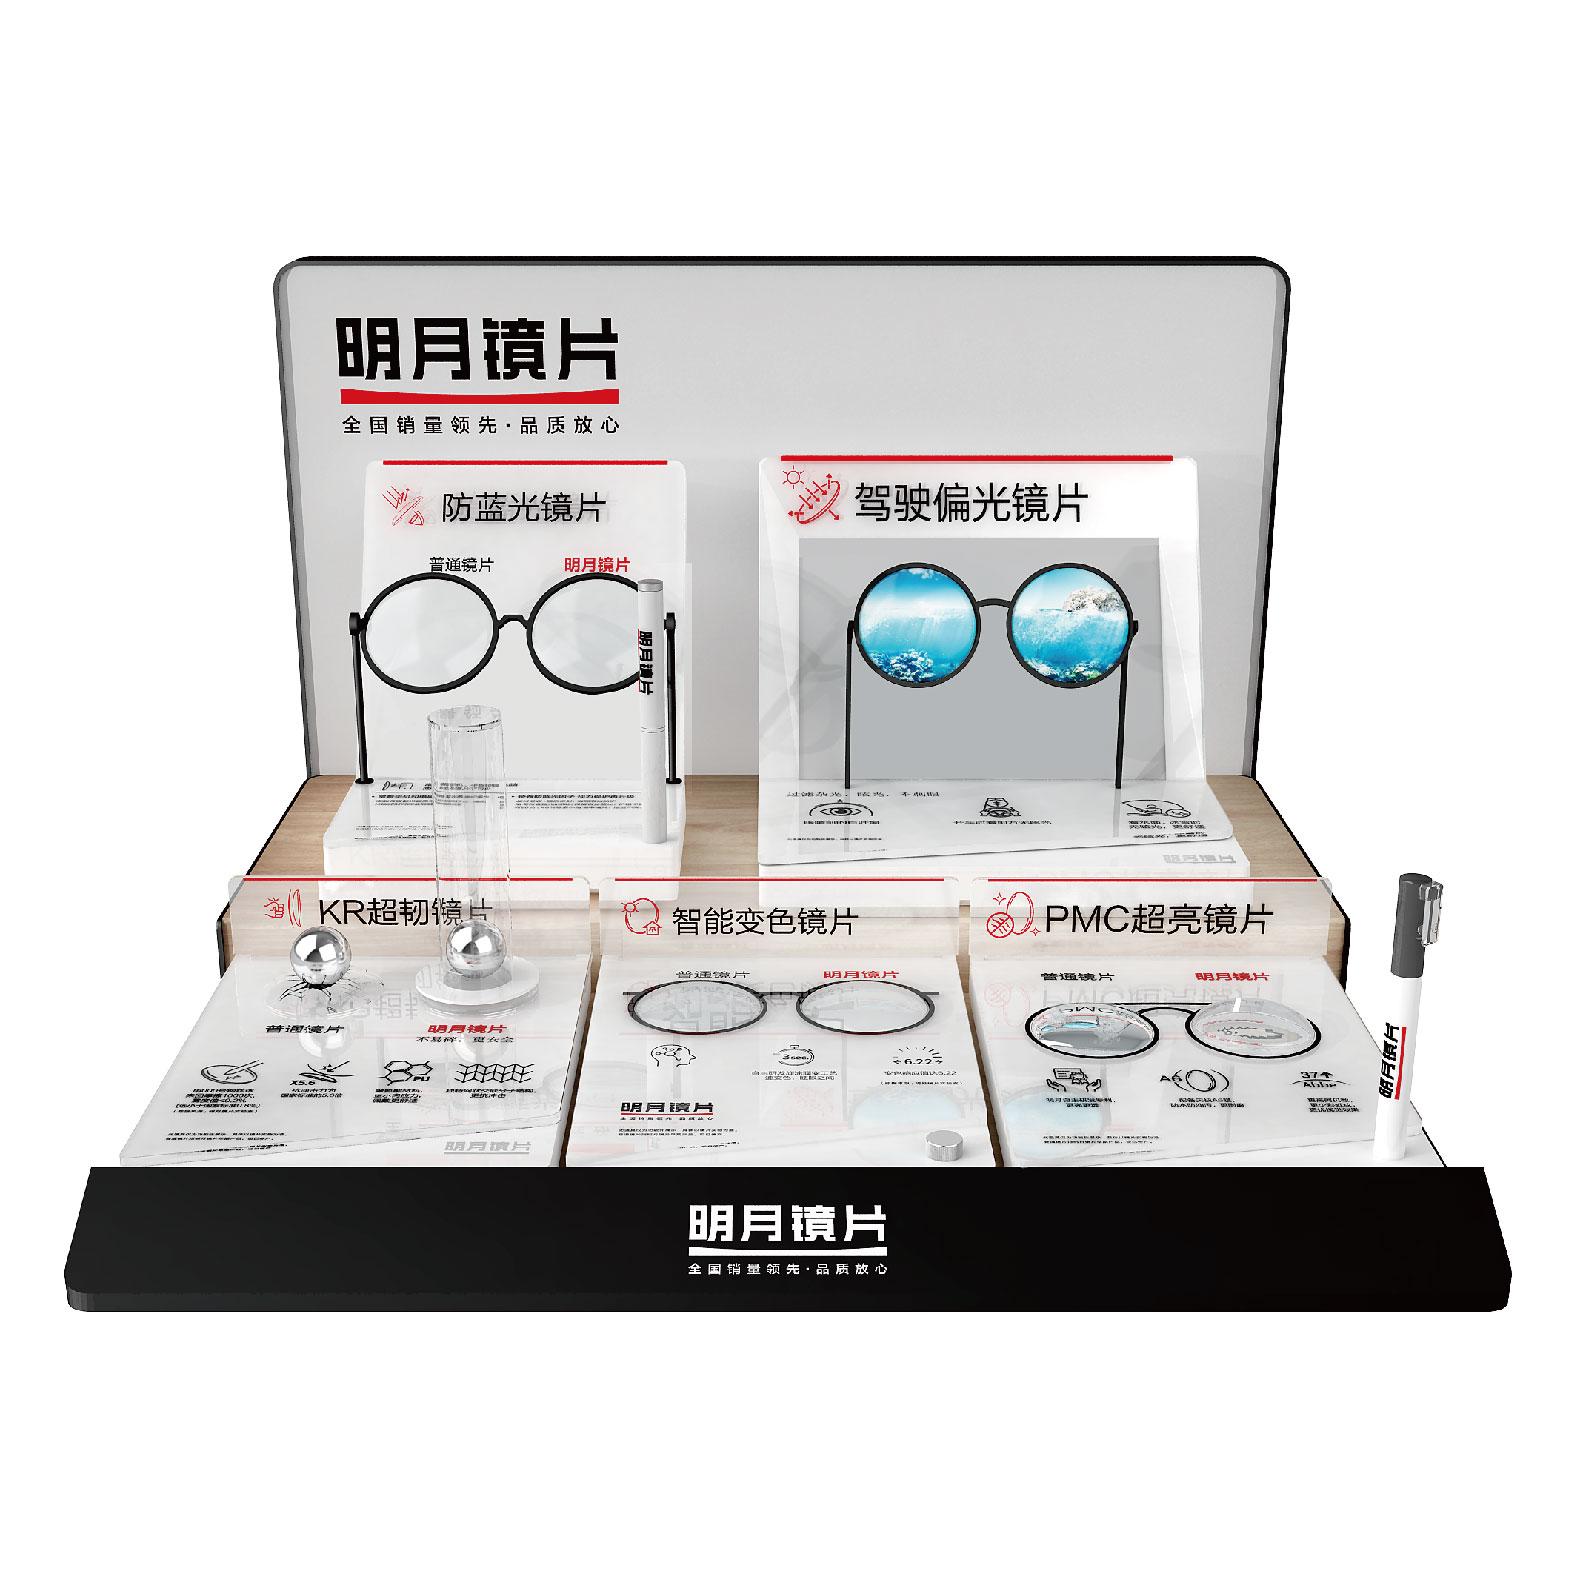 Ming Yue Lens POSM